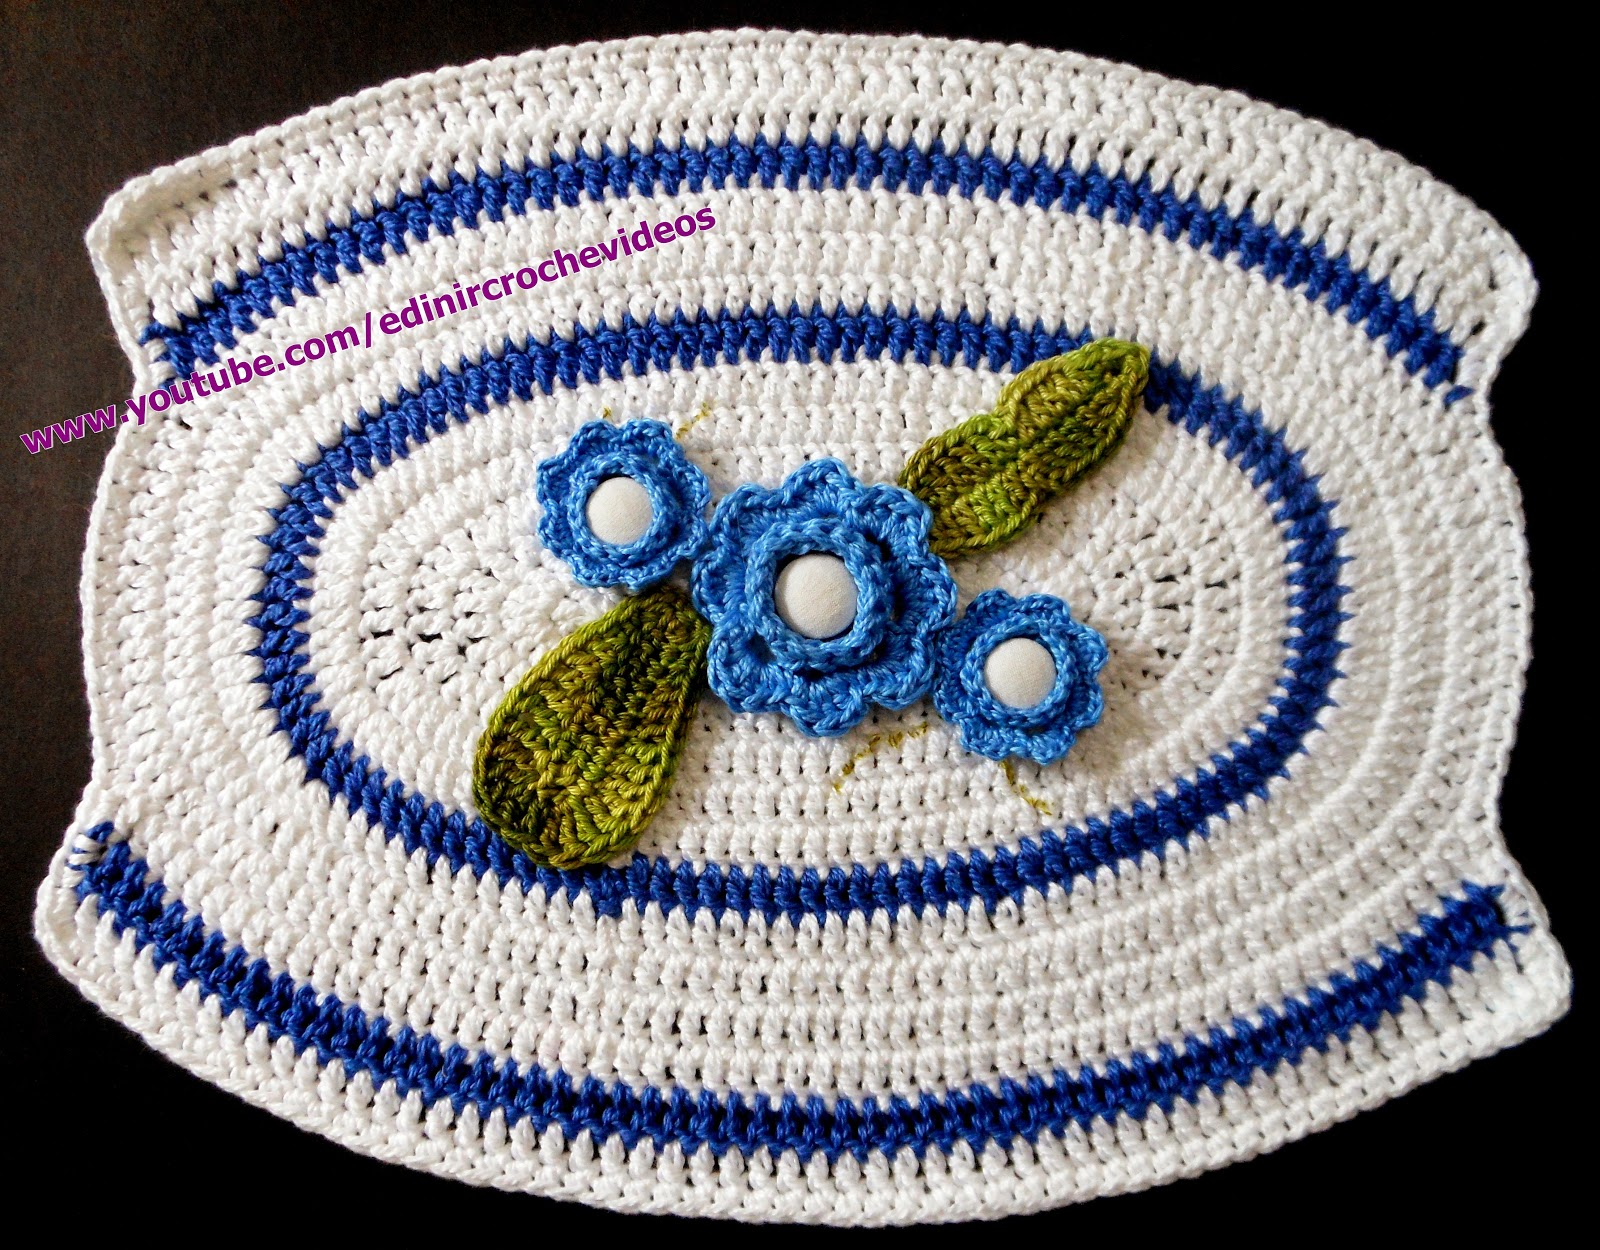 mini caminho mesa croche aprender croche com edinir-croche dvd video-aulas loja curso frete gratis